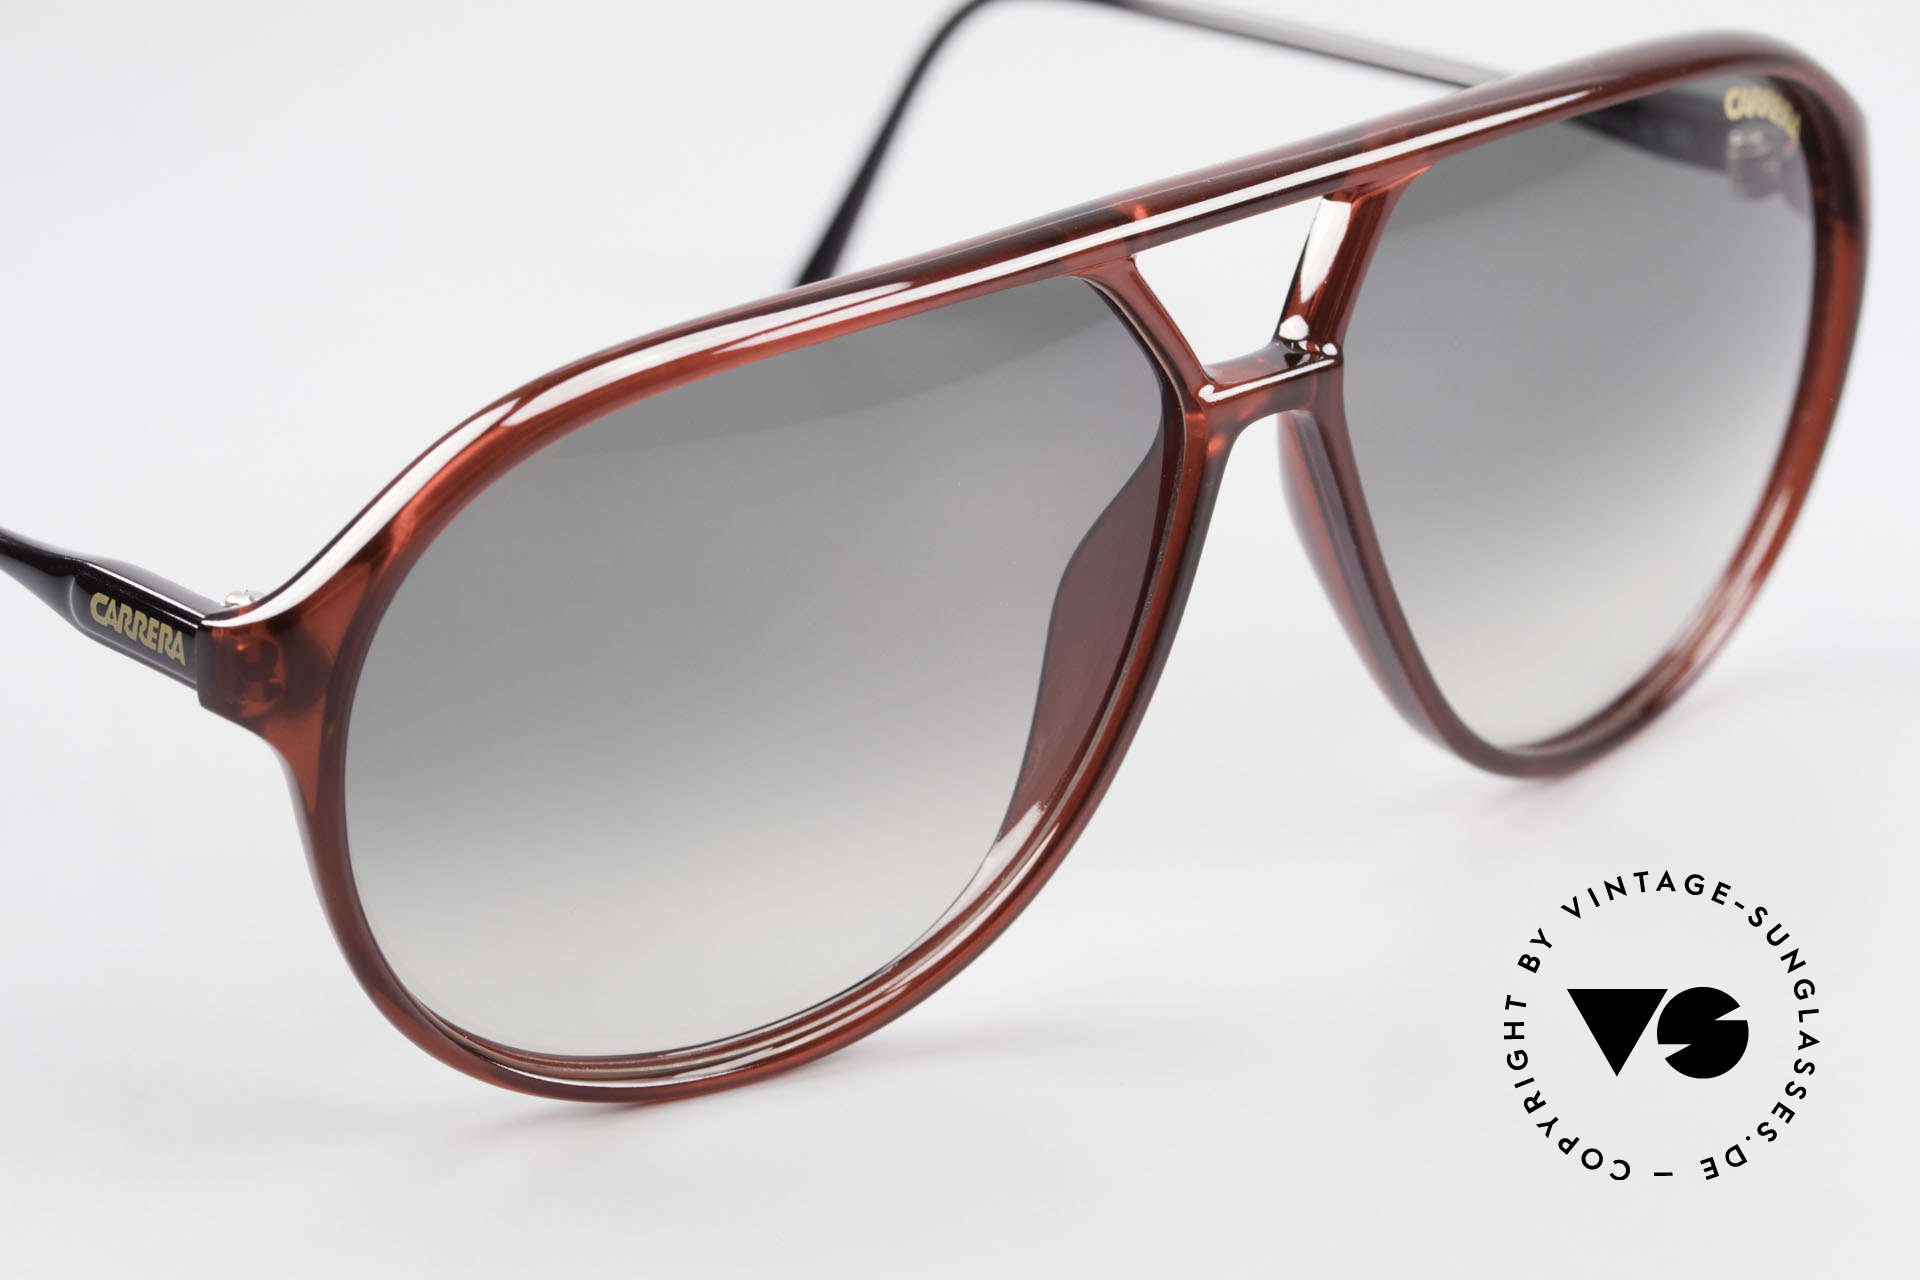 Carrera 5425 Robert De Niro Sunglasses 90's, unworn, NOS (like all our rare vintage 90's sunglasses), Made for Men